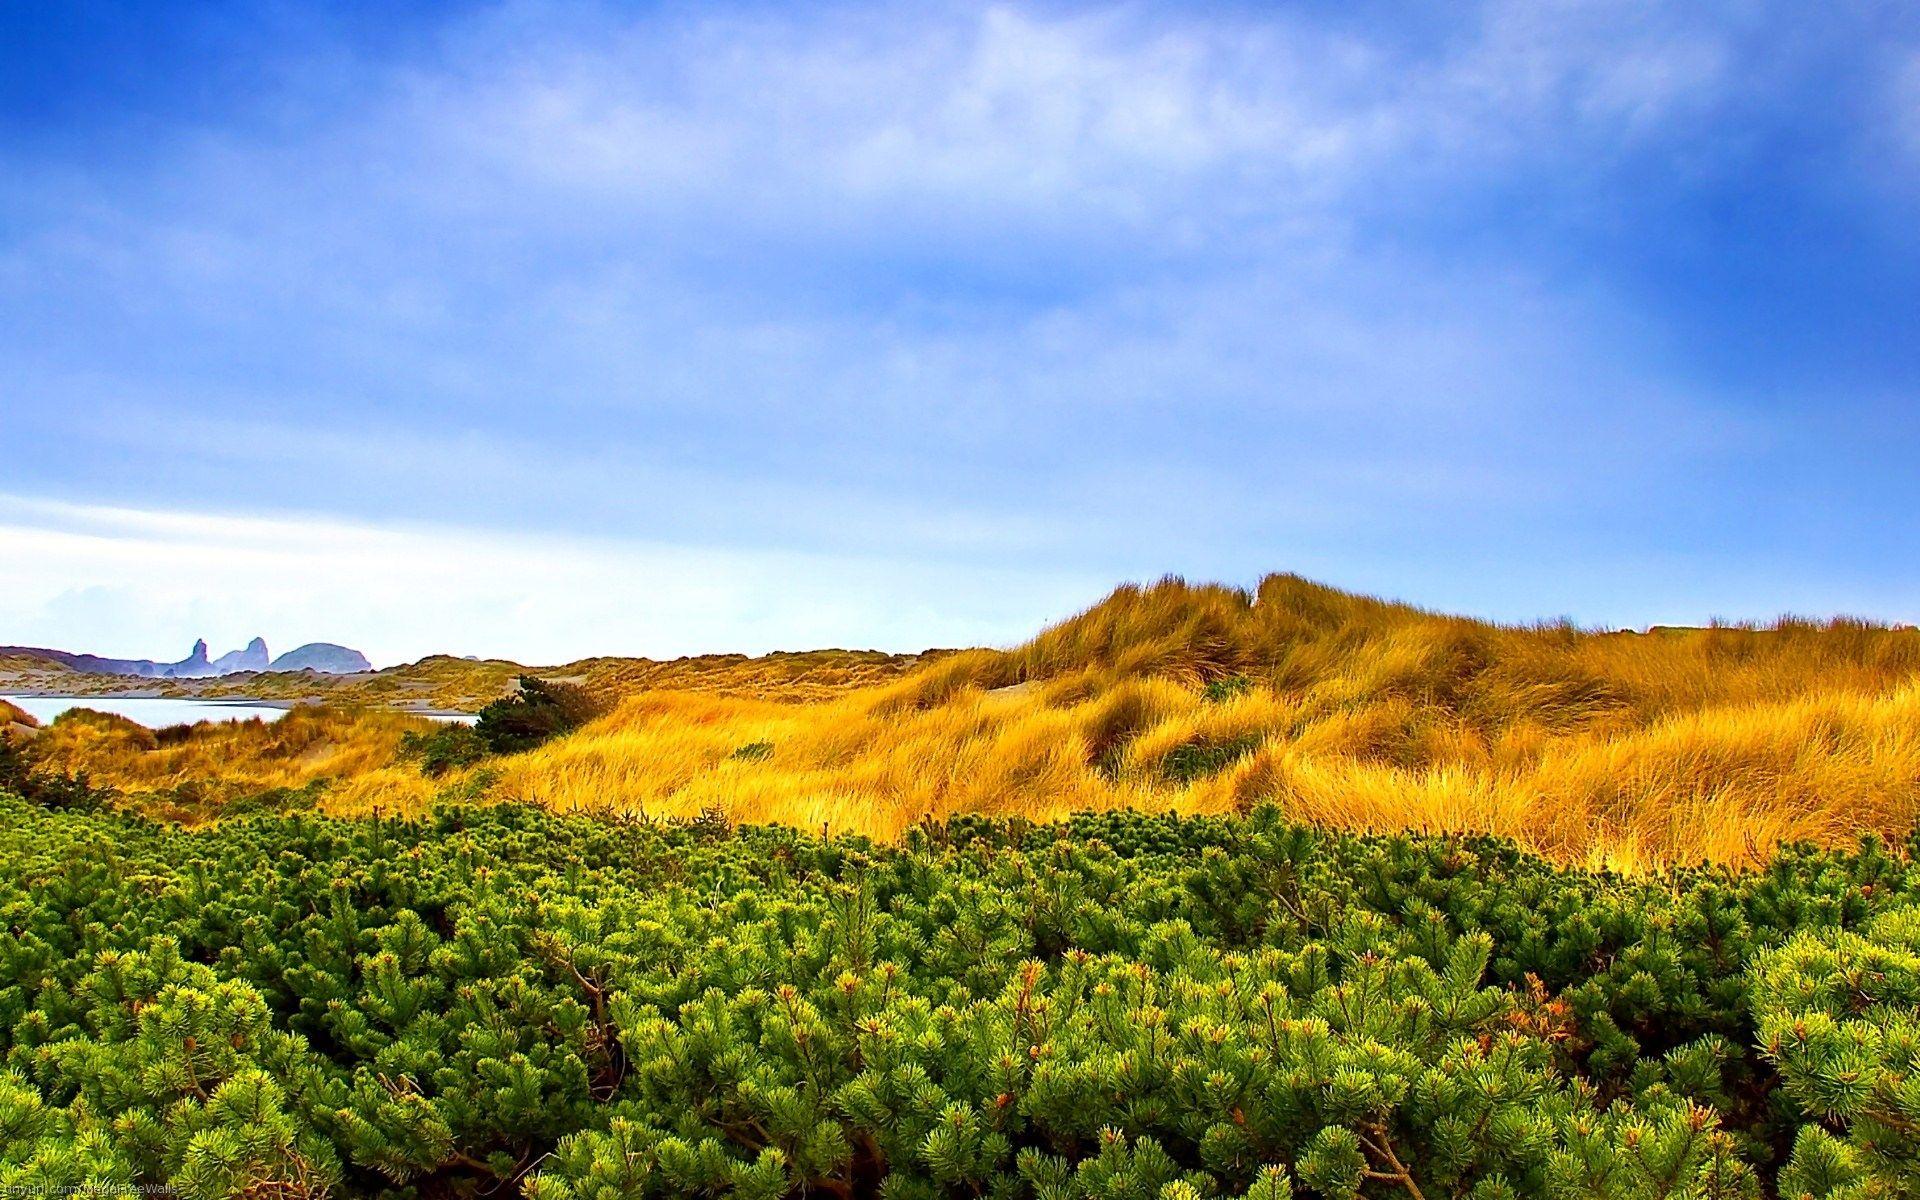 1920x1200 High Quality Landscape Windows Vista Wallpaper Nature Wallpaper Landscape